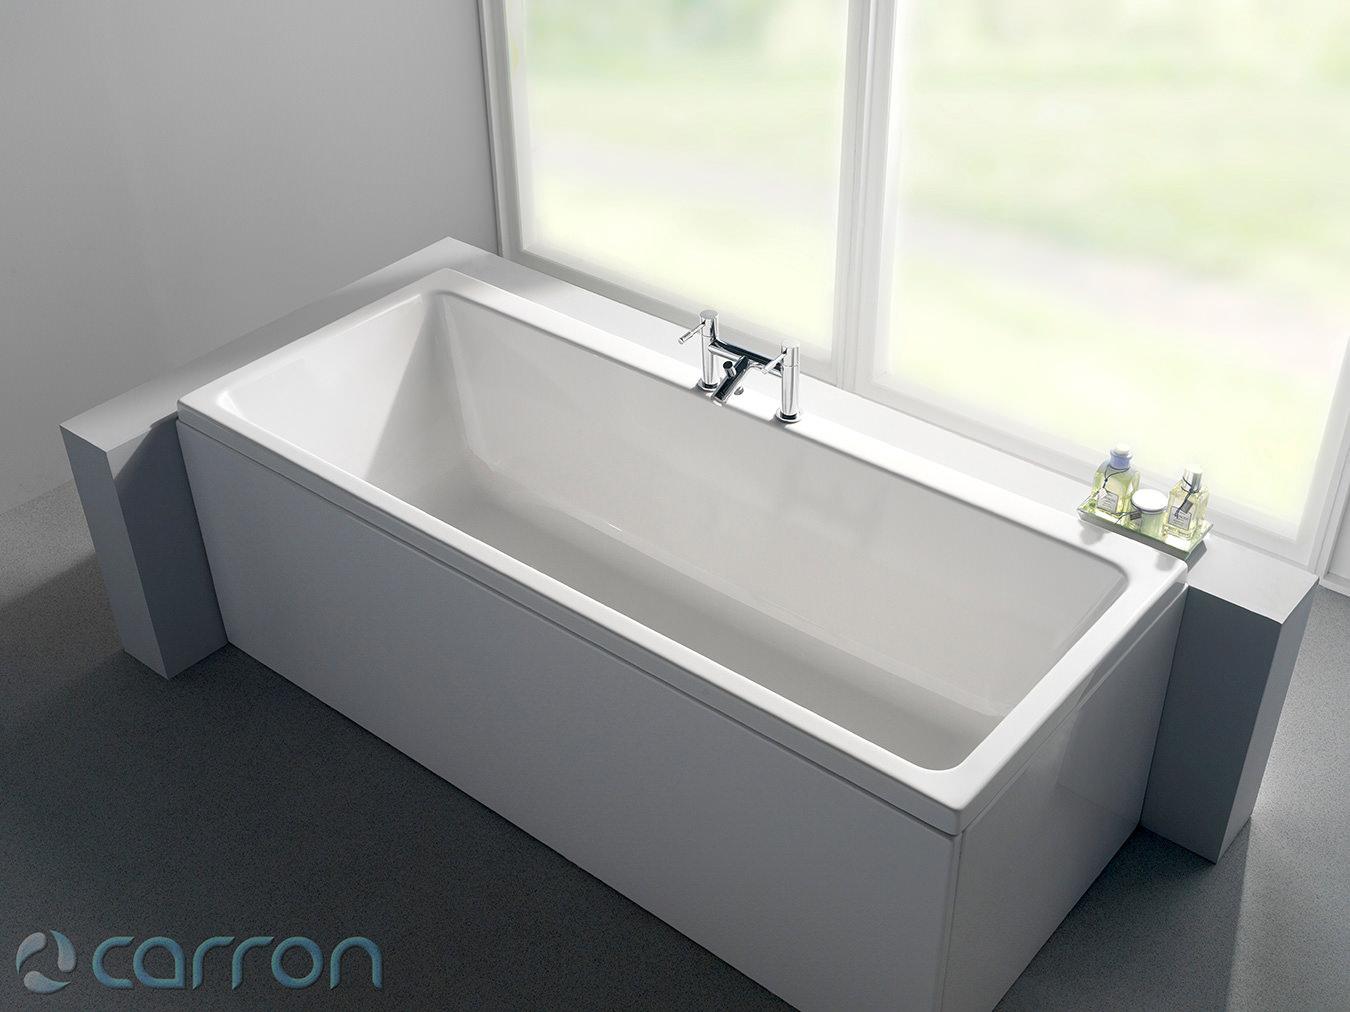 Carron Quantum Double Ended Acrylic Bath 1700 X 700mm Q4 02159